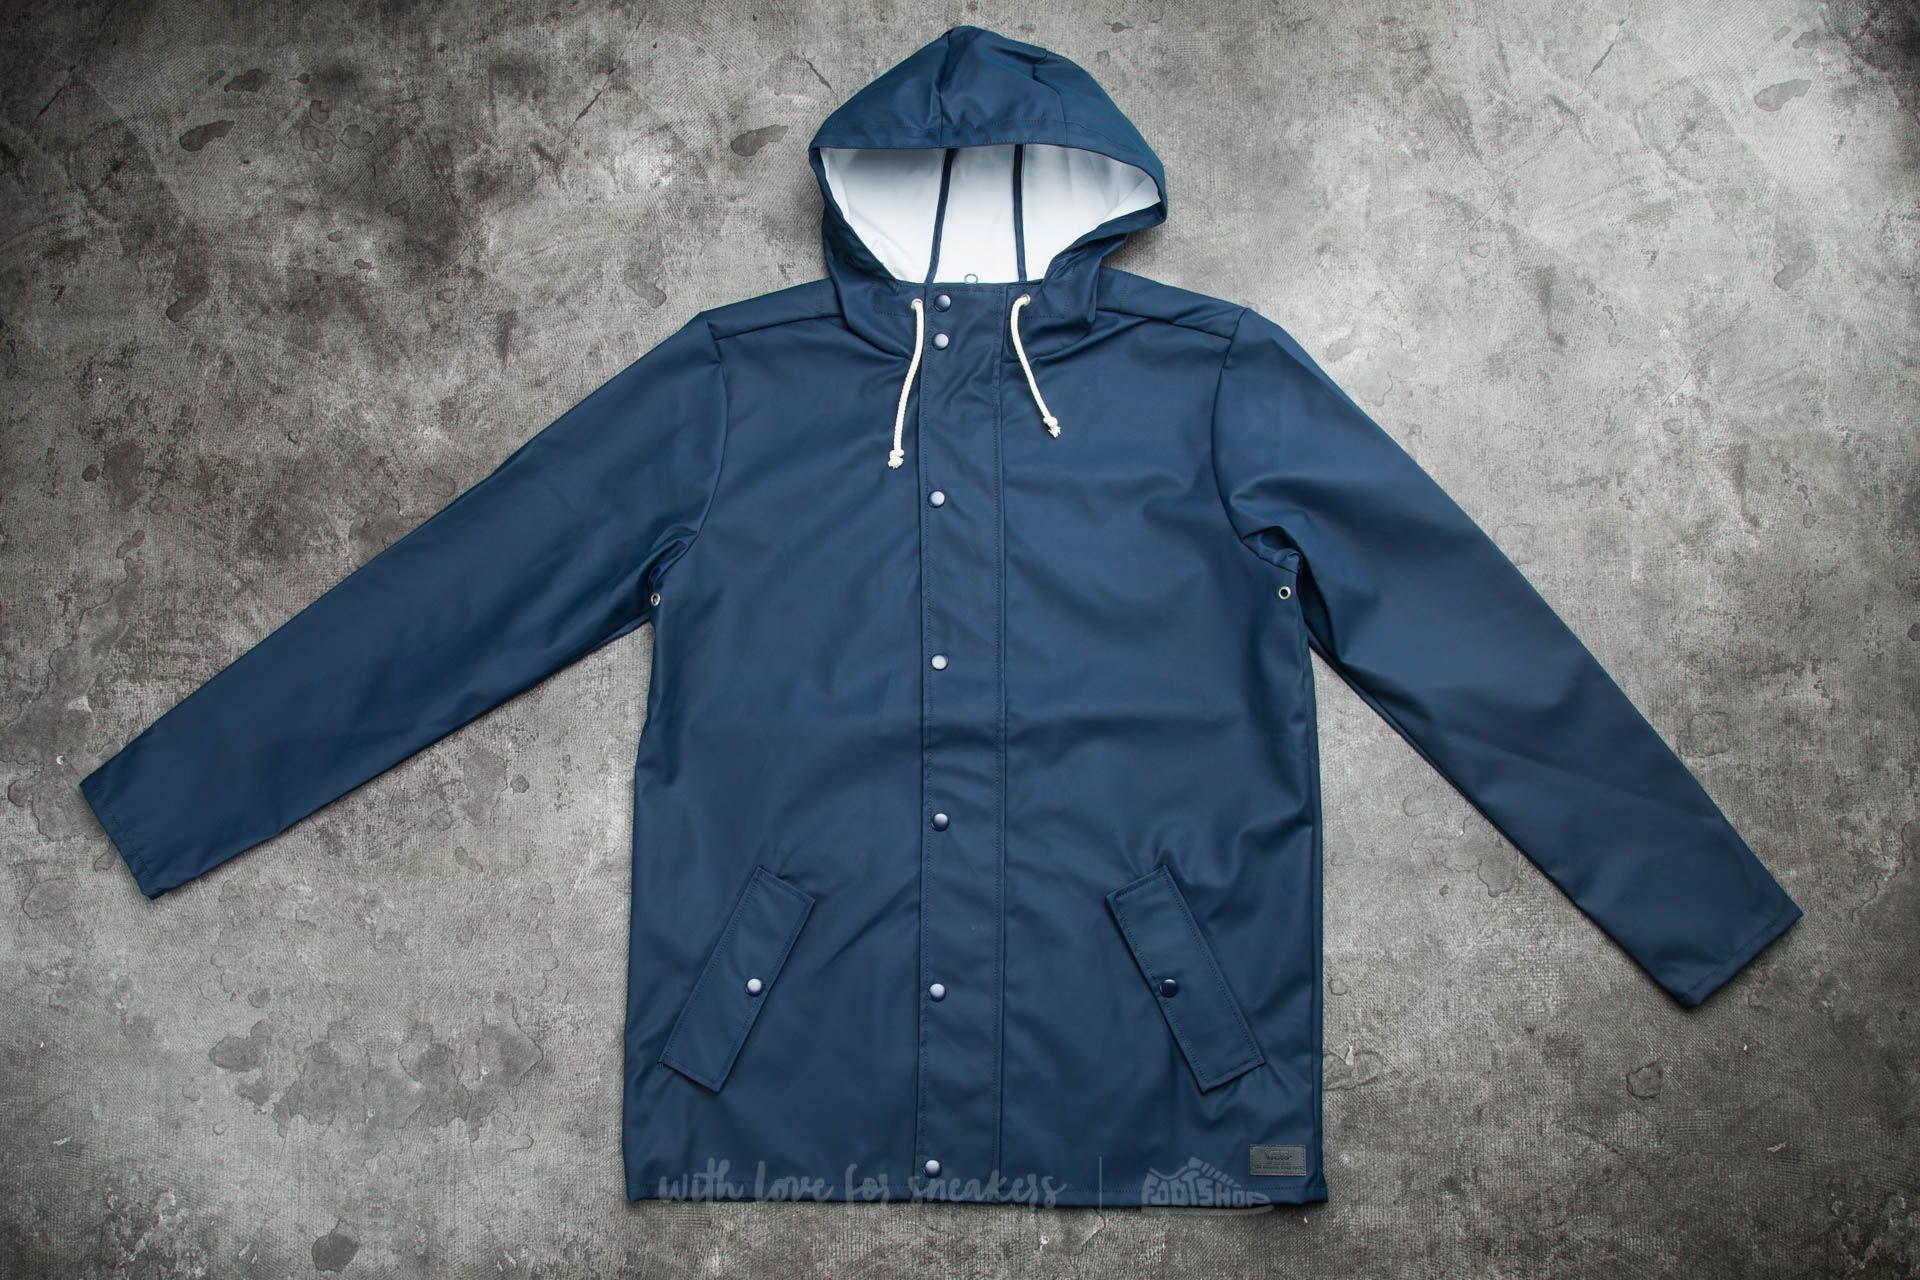 Vans Junipero Mountain Edition Jacket Dress Blues